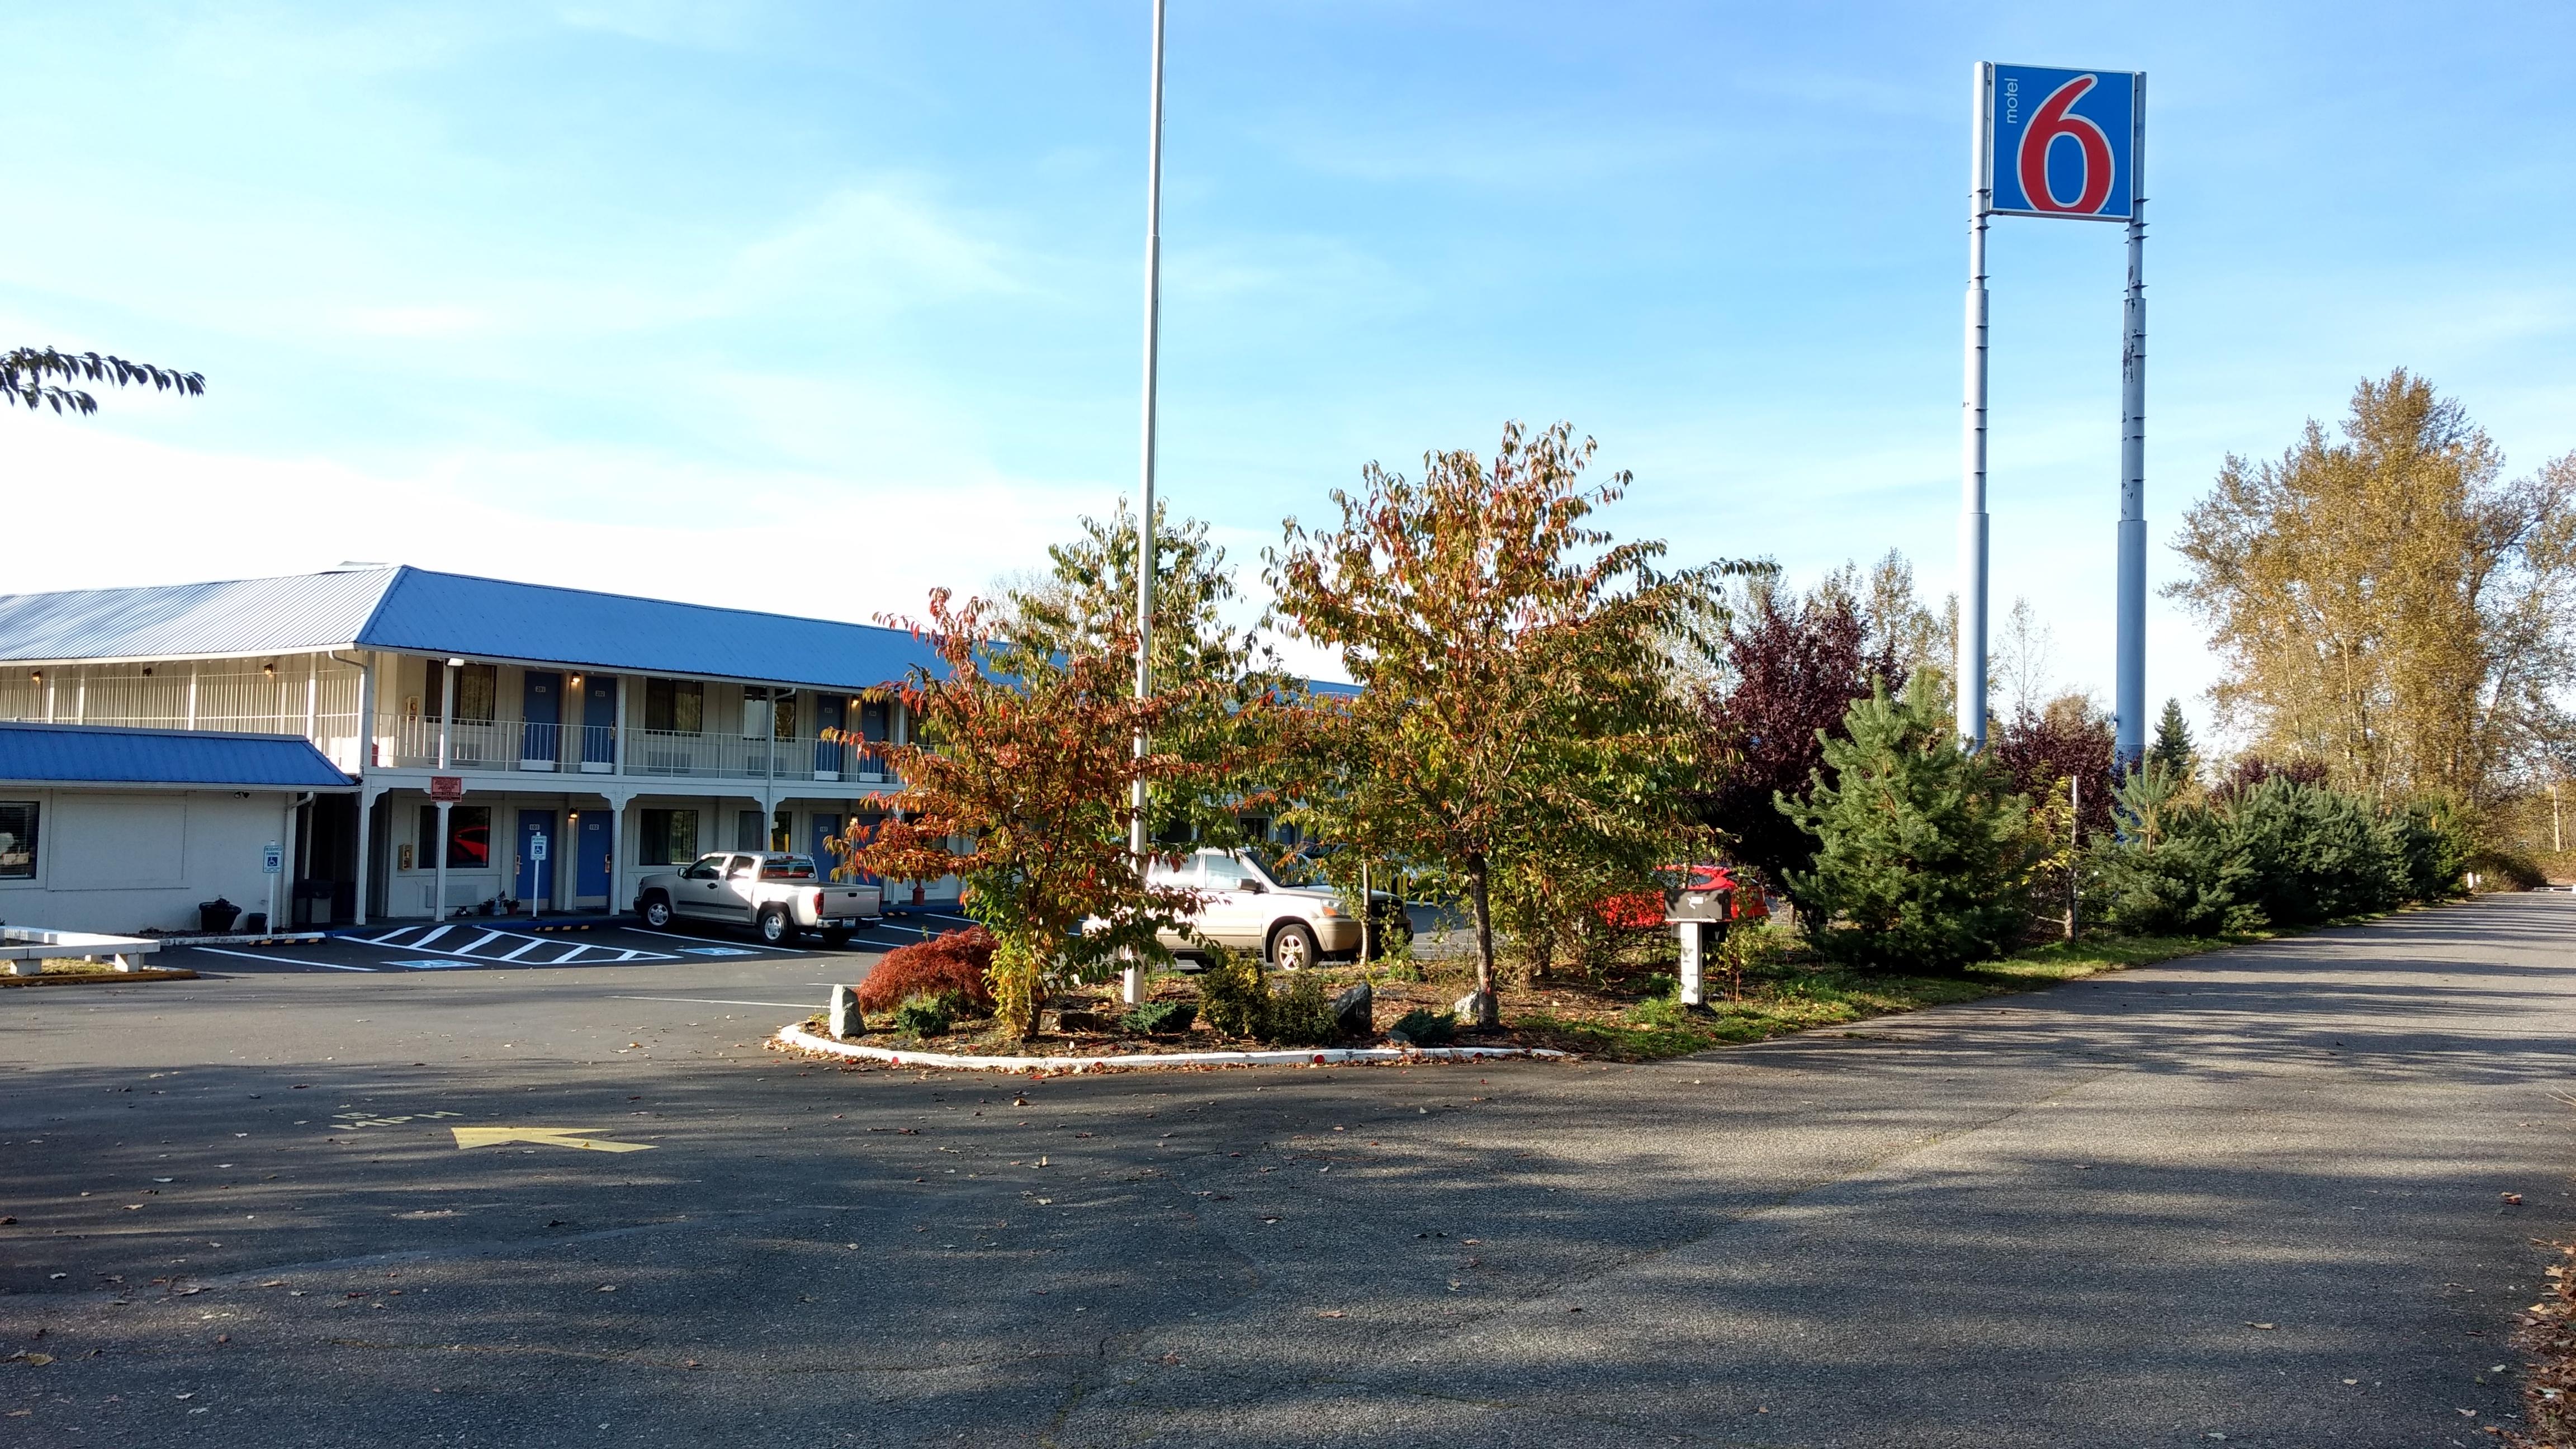 motel 6 exterior 2019-10-10